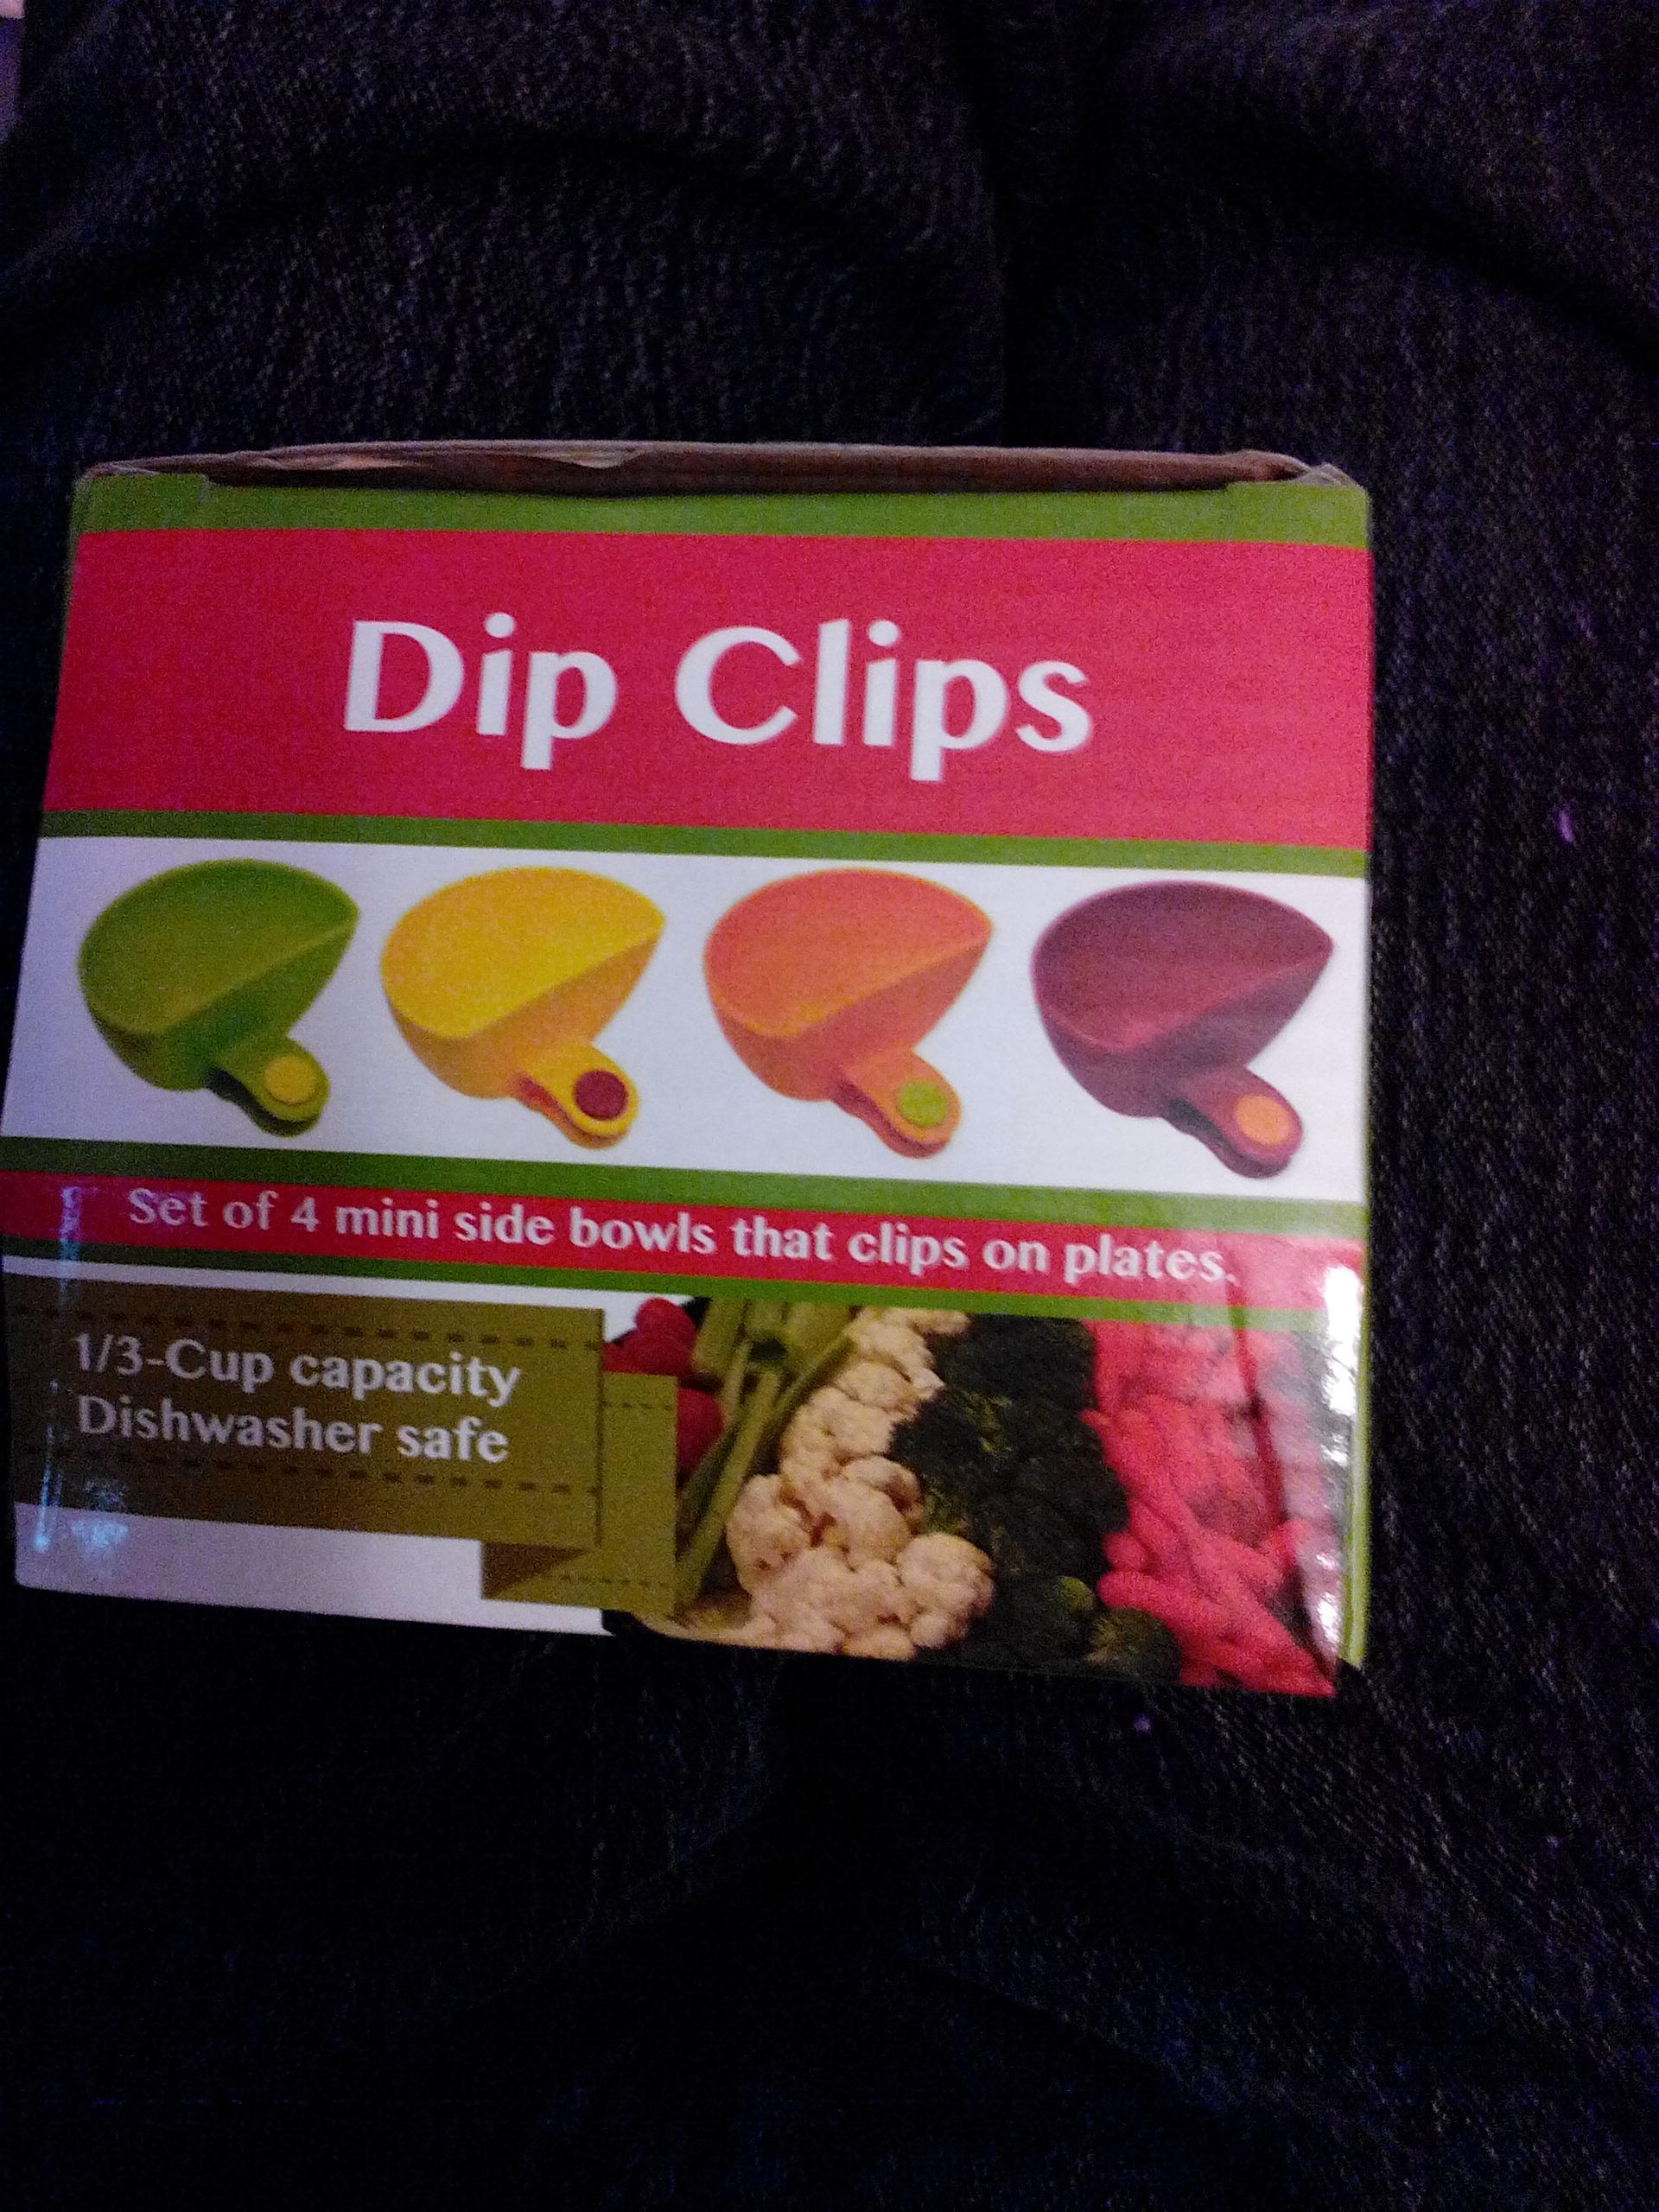 Dip Clips Ornament - Kingsbridge International, Inc. (2016) front image (front cover)